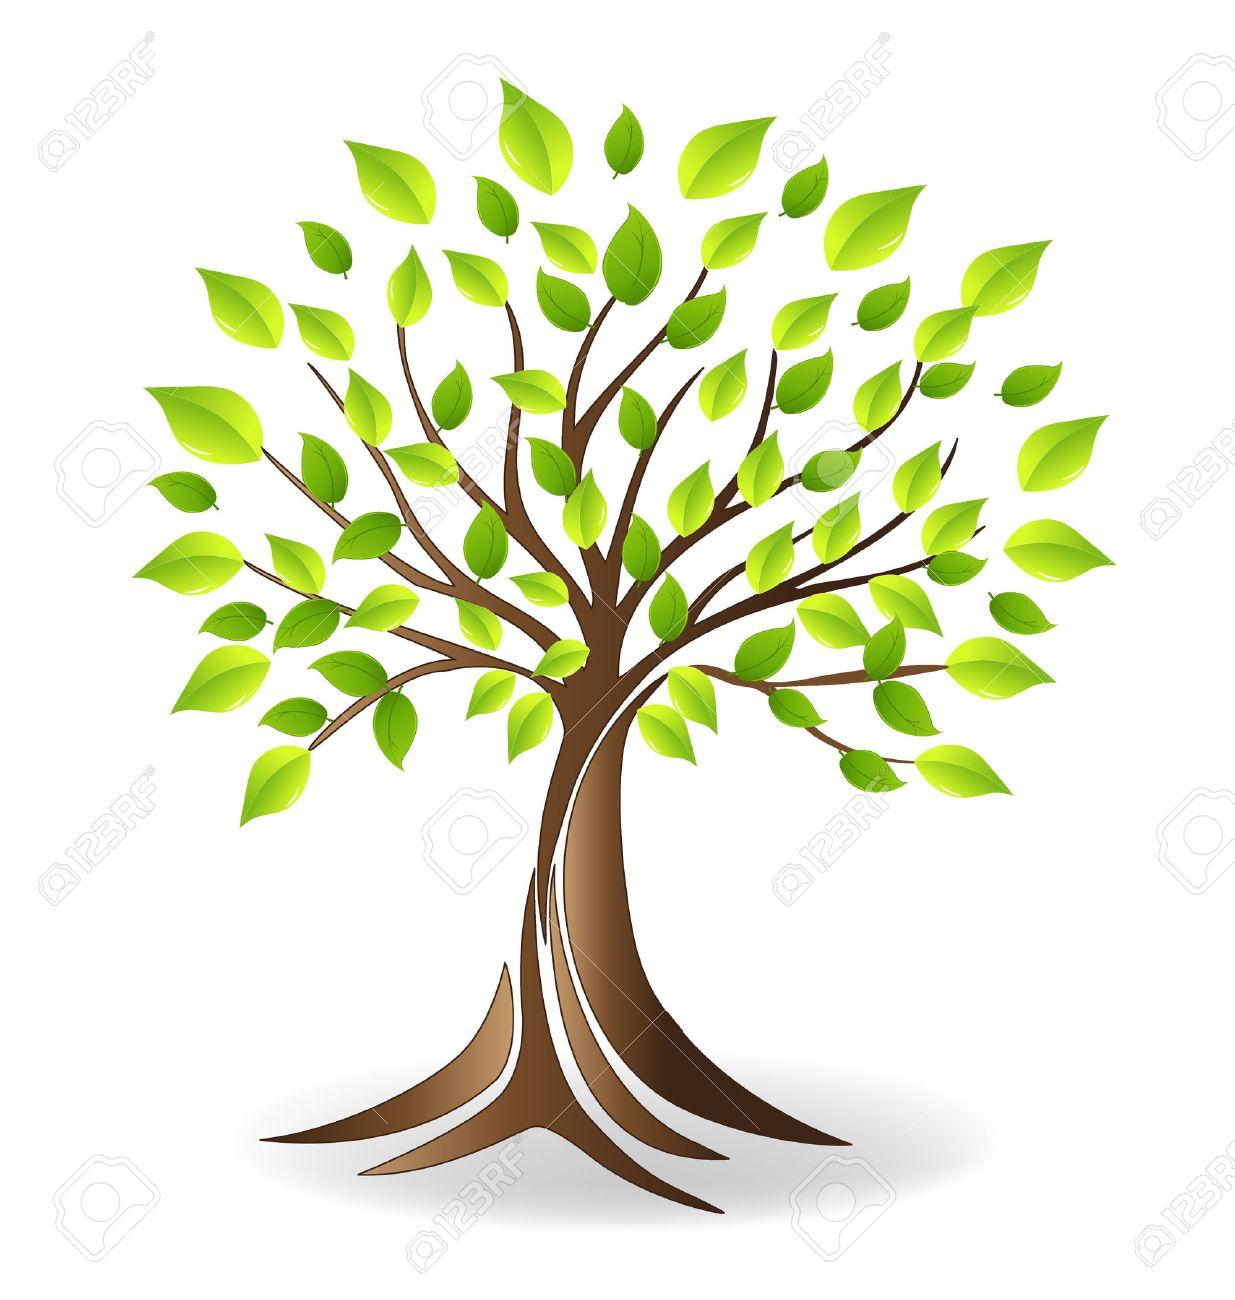 Ecology tree vector - 65296117